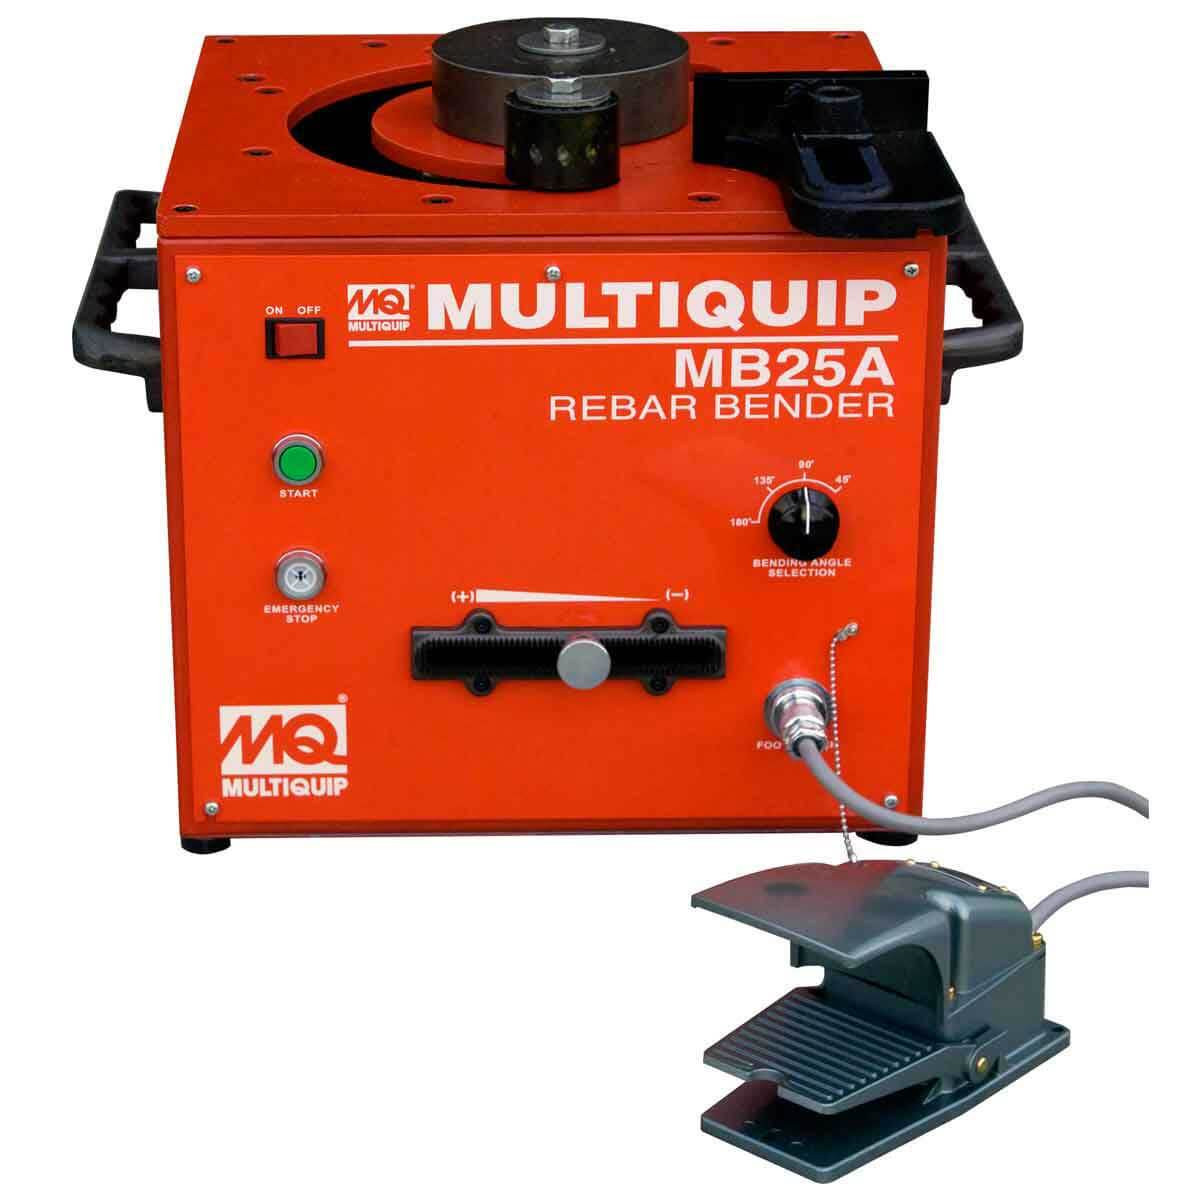 1 inch Bar Capacity MB25A Multiquip Portable Rebar Bender